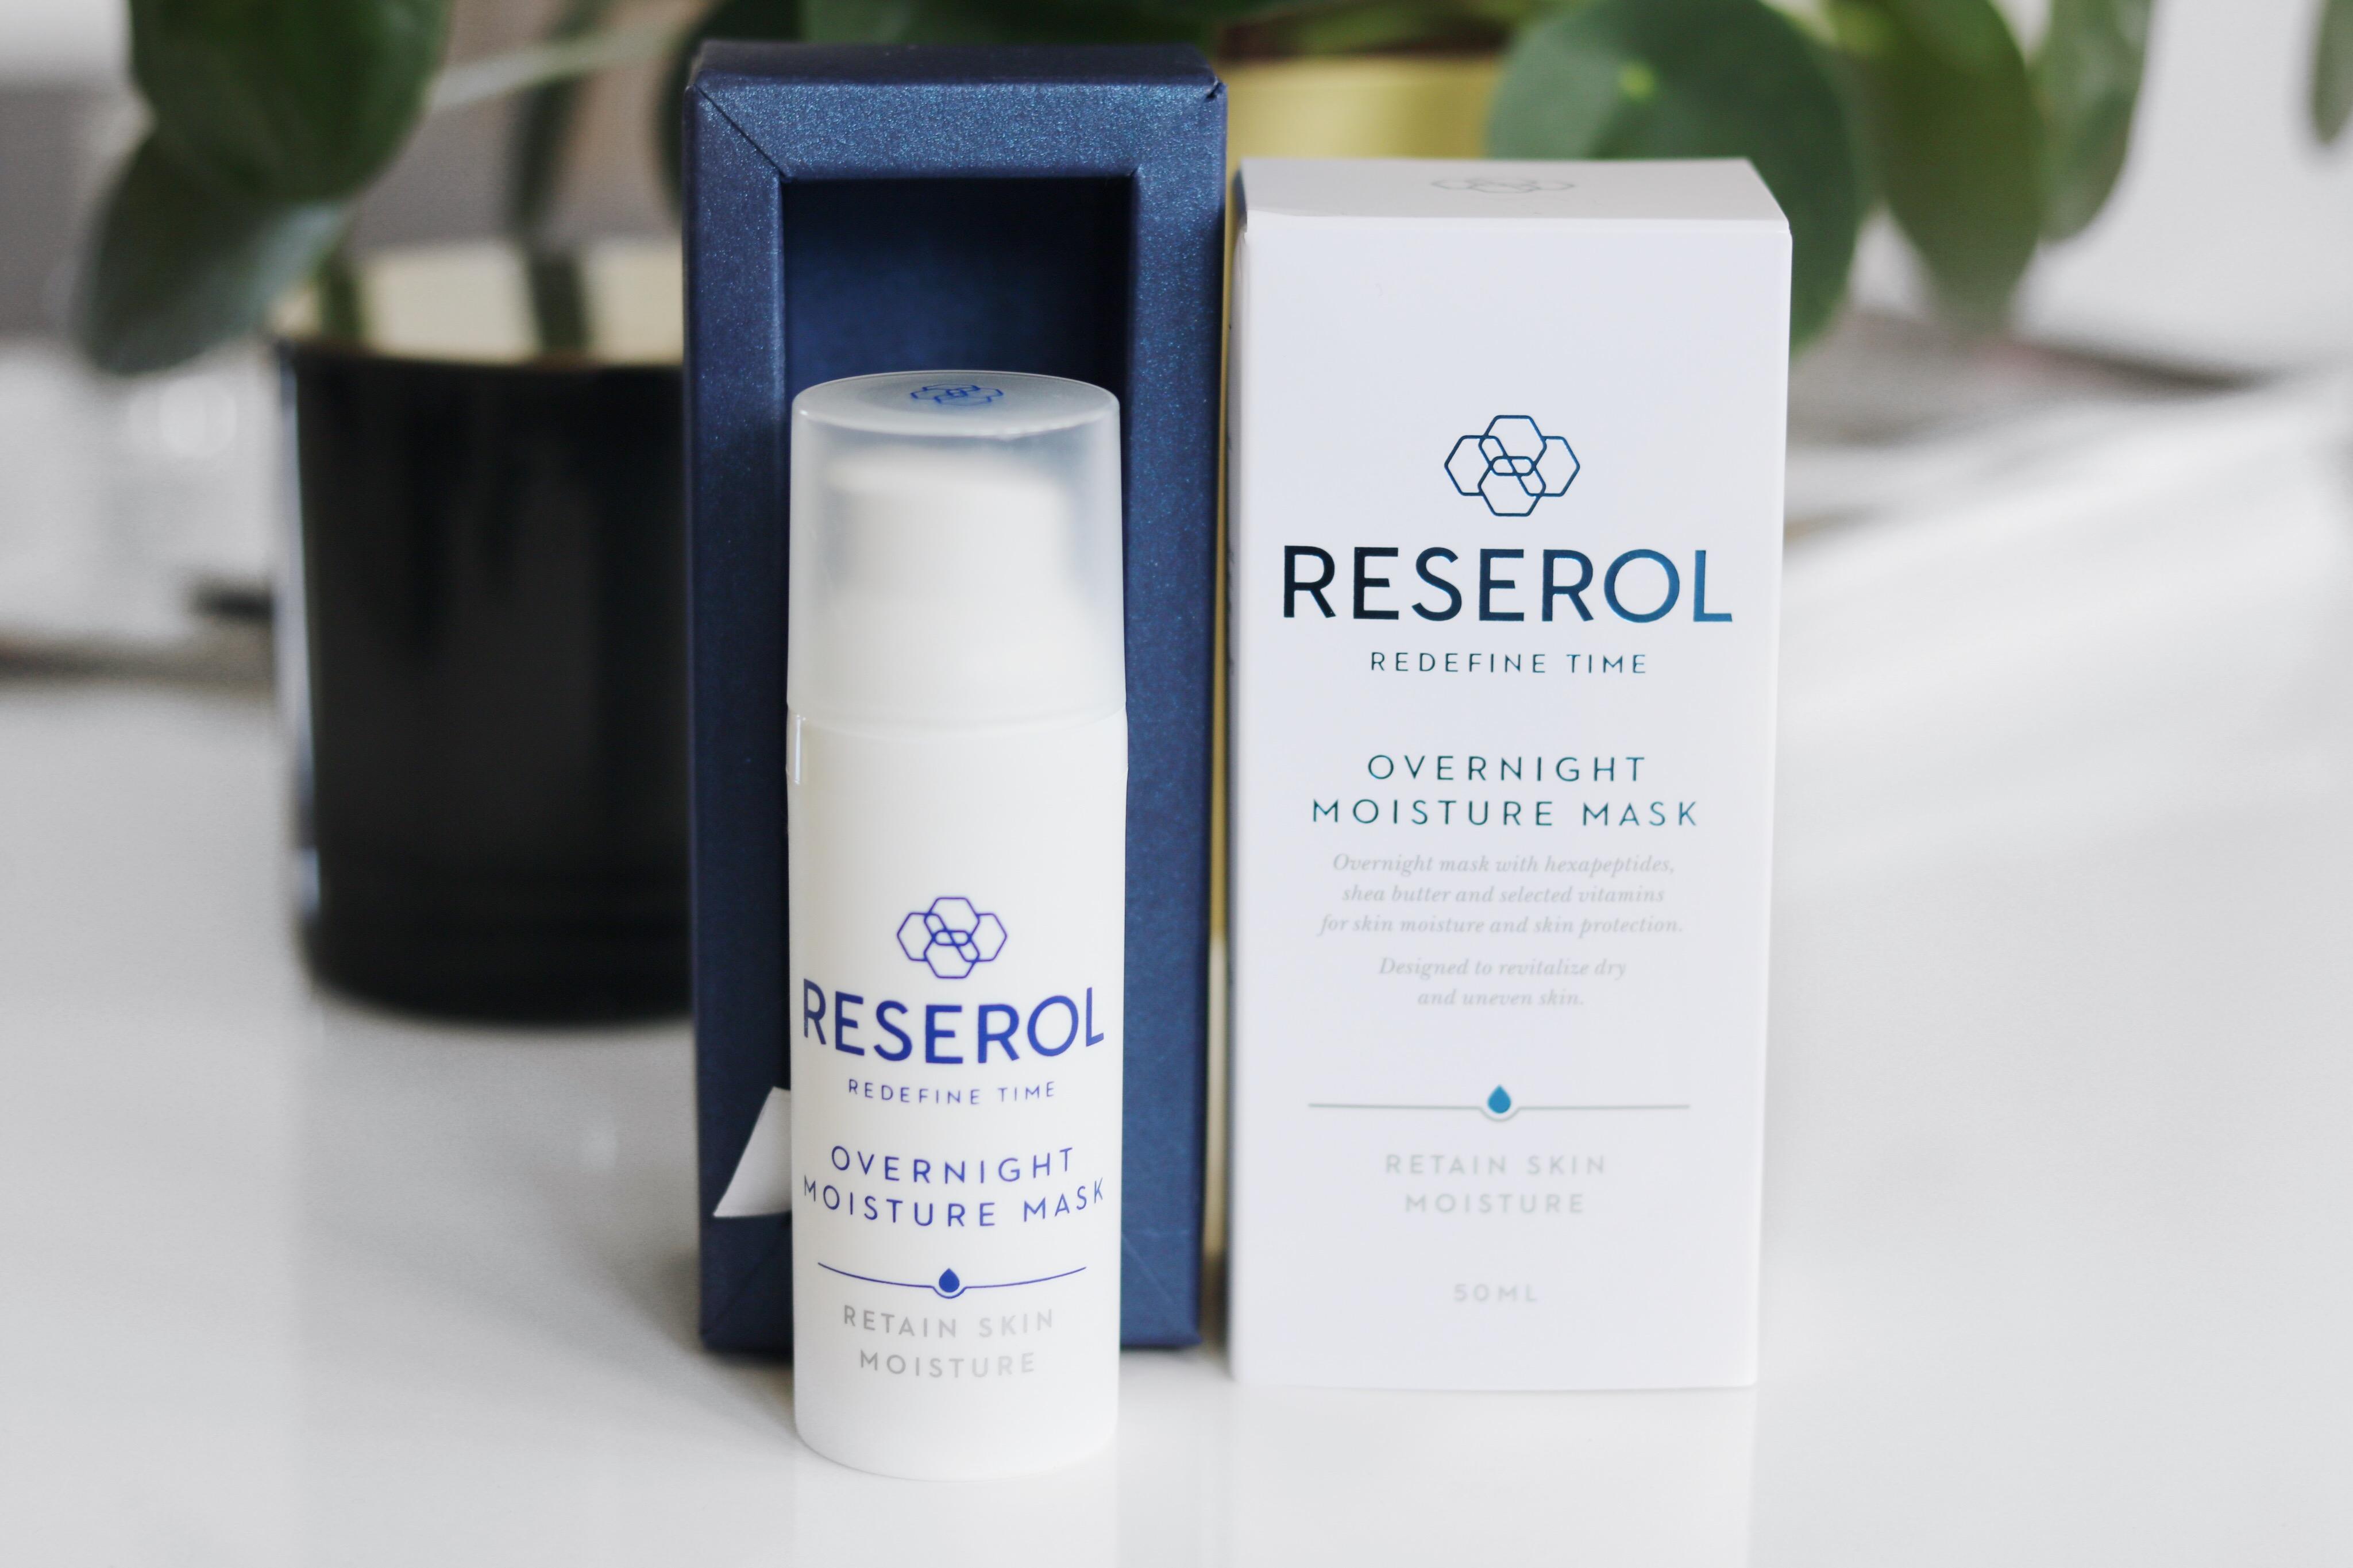 Reserol, Reserol Beauty, Amandahans, Skönhetsblogg, Skönhetsbloggare, Reserol films, Reserol Overnight Moisture Mask